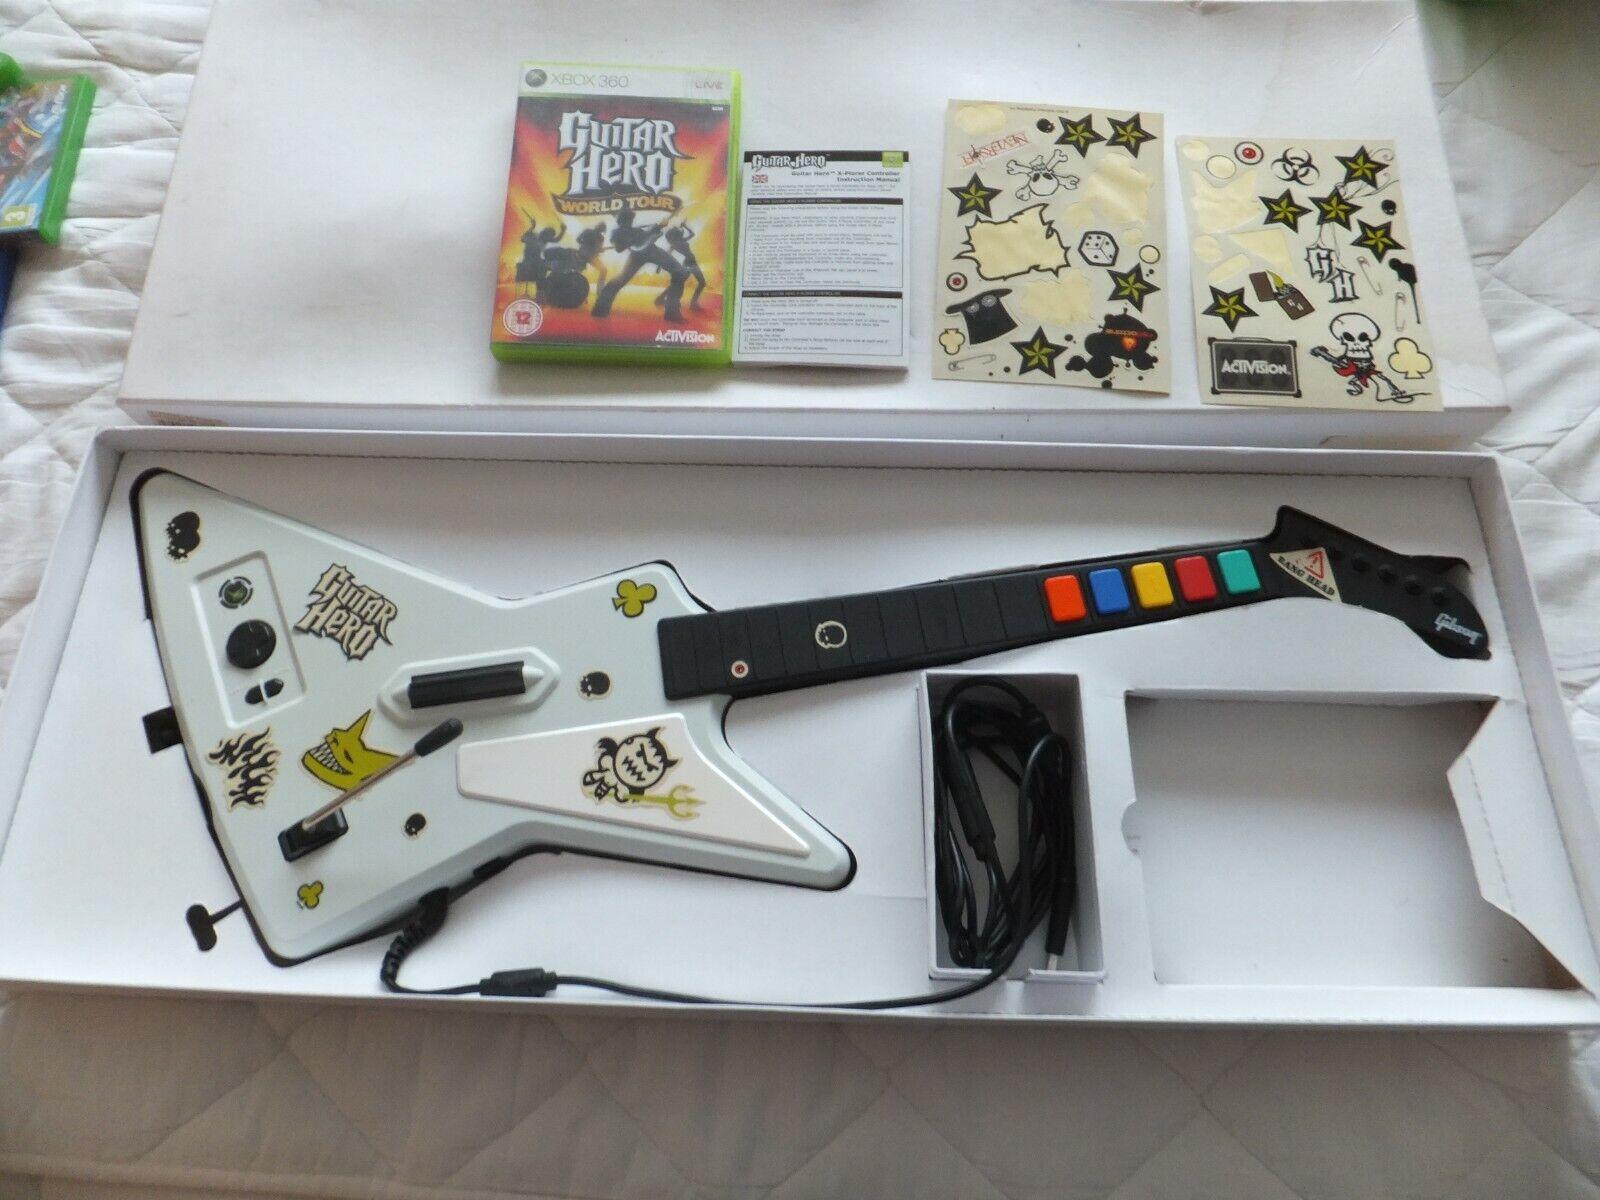 Guitar Hero Wired Guitar Controller Xbox 360 Xplorer White Gibson Guitar Boxed